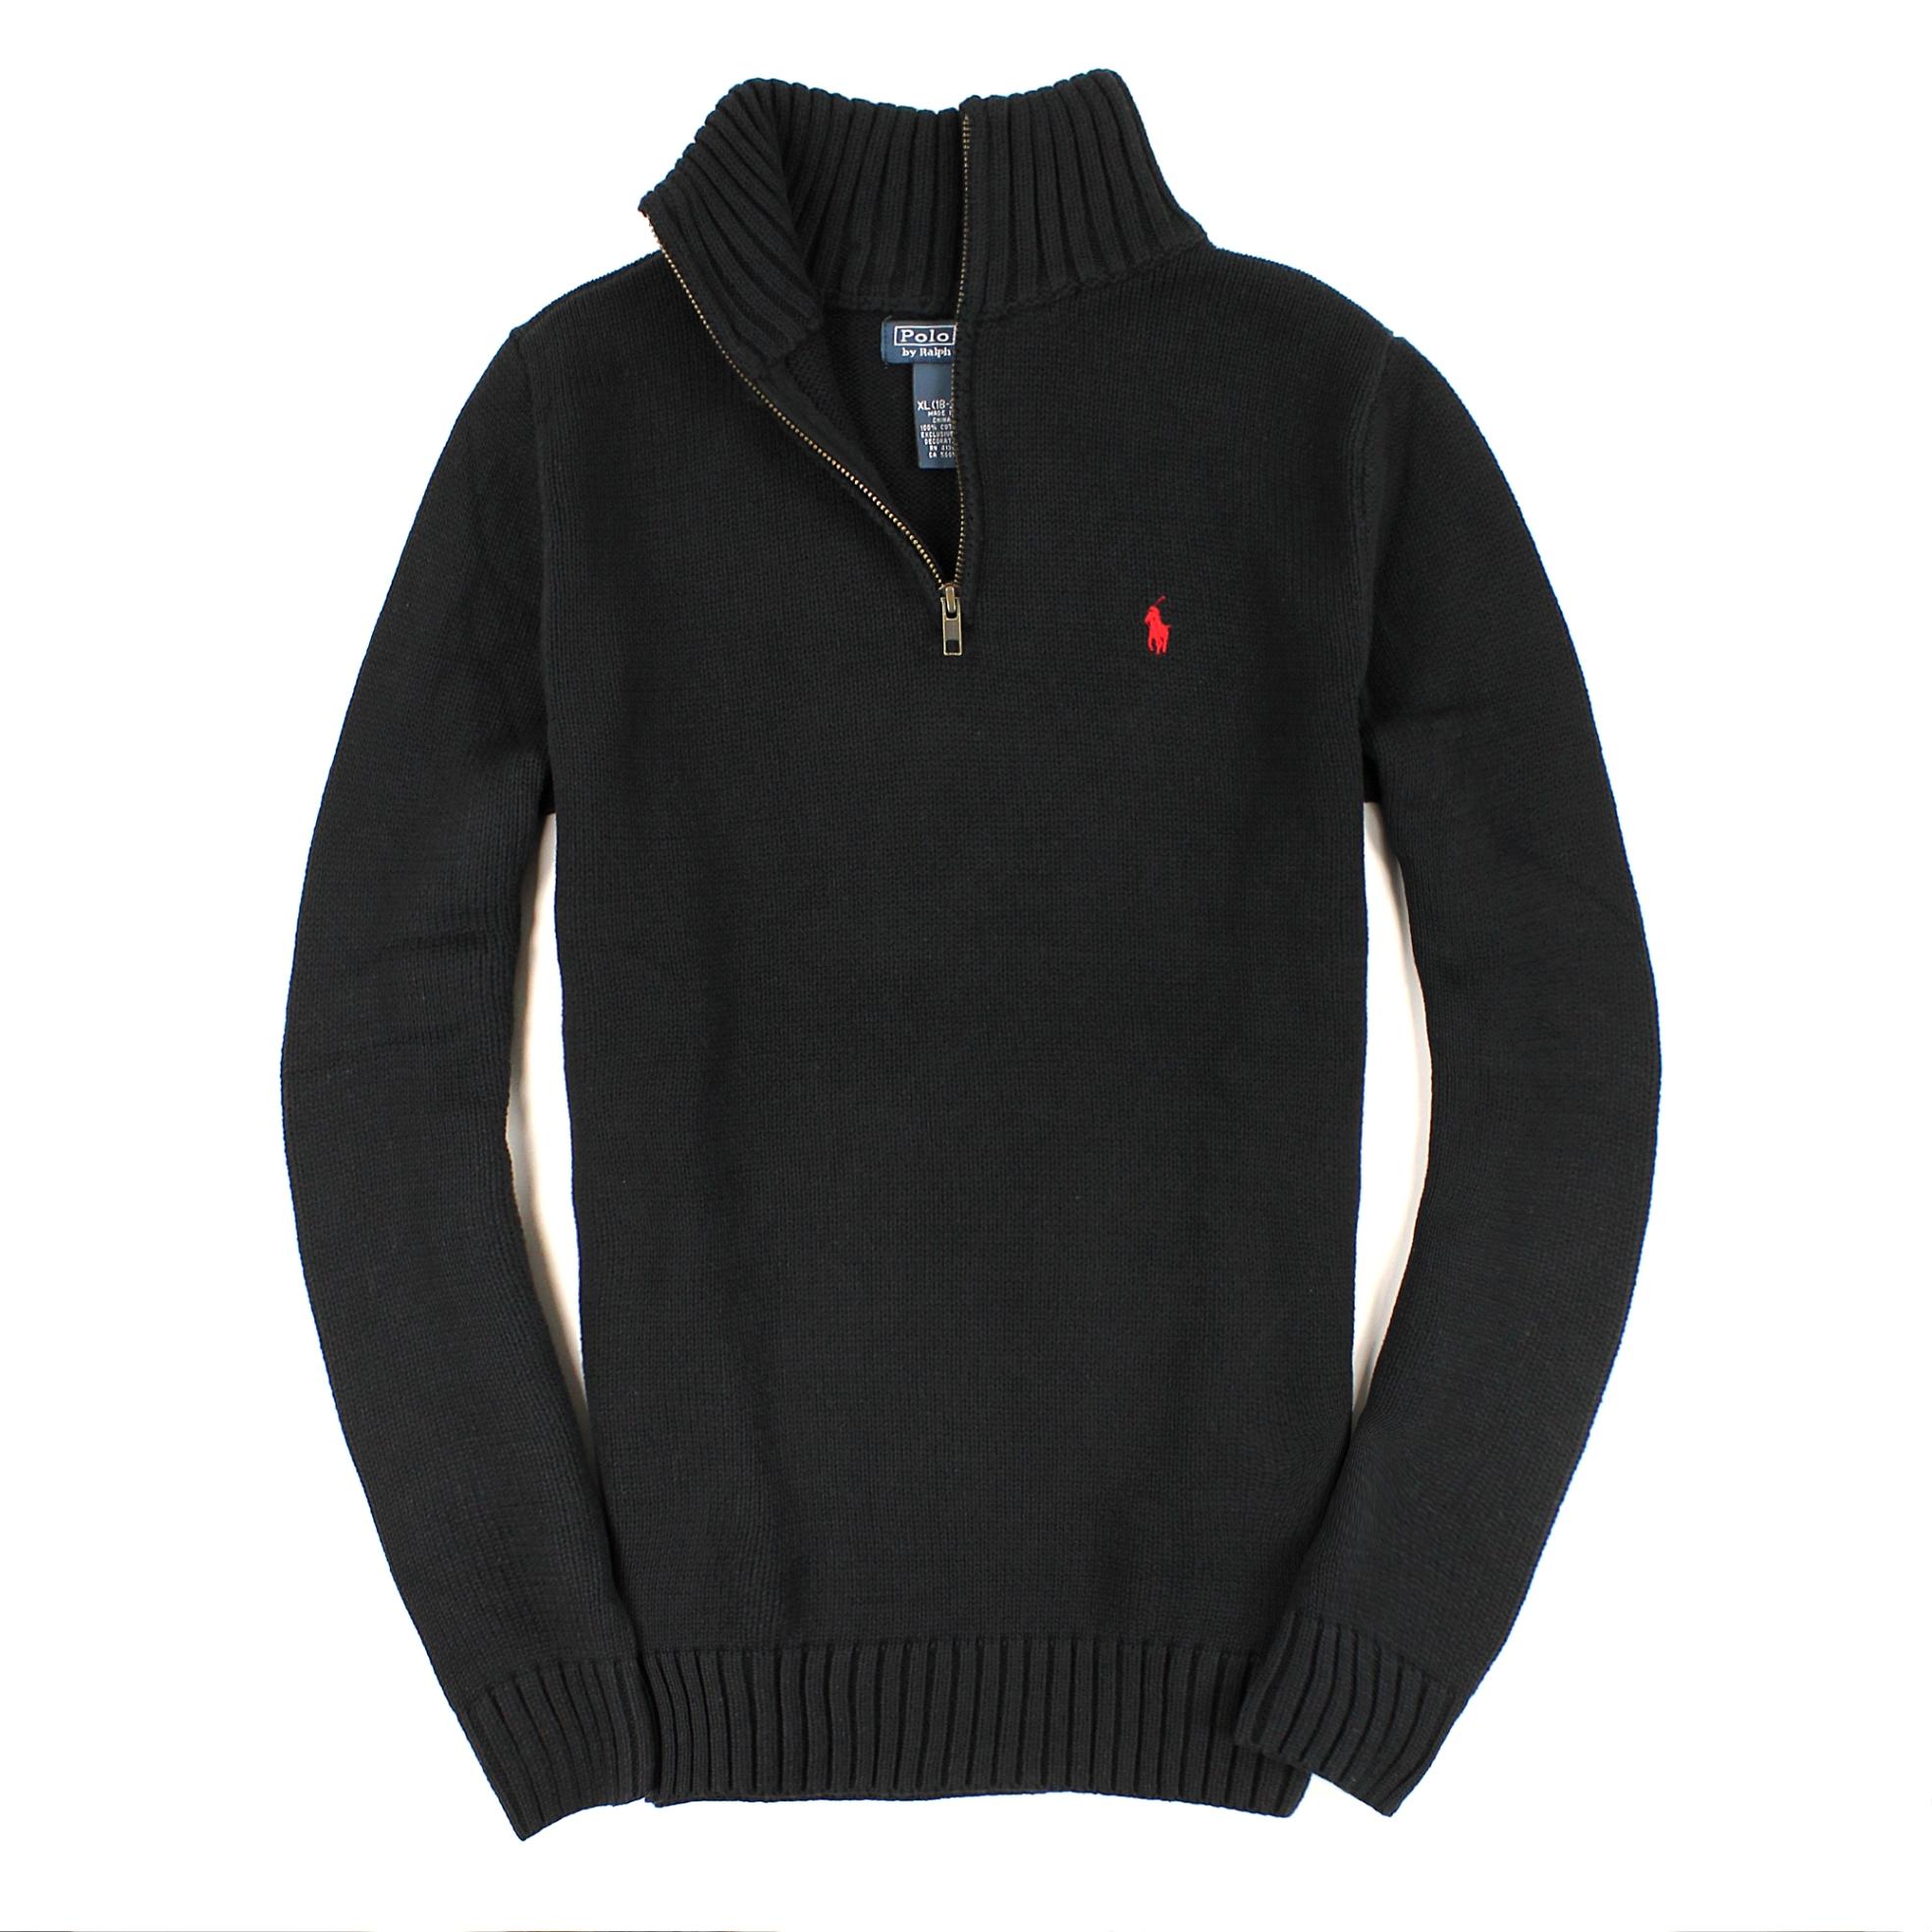 Q美國百分百【全新真品】Ralph Lauren 針織衫 RL 棉質毛衣 Polo 小馬 黑 半拉 厚棉 立領 男 S號 C004